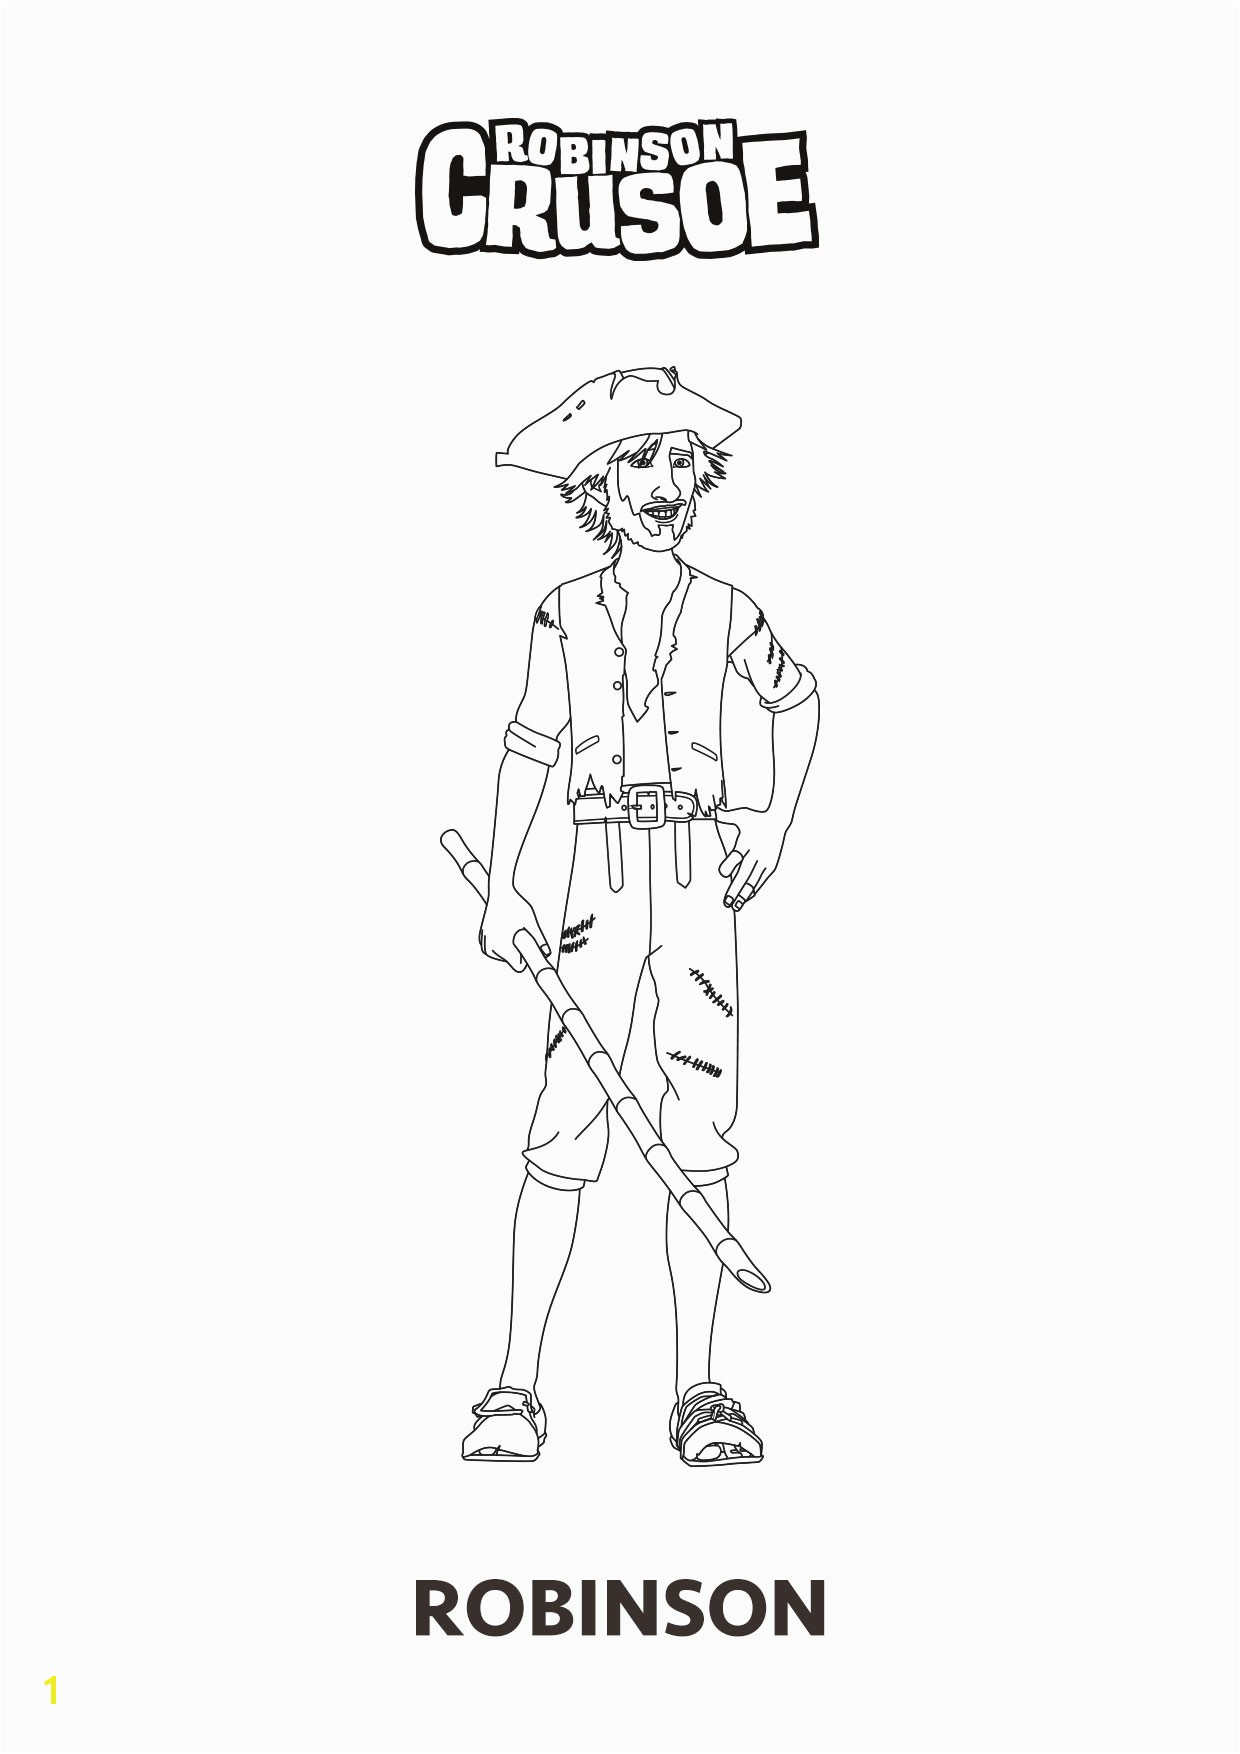 nWave RobinsonCrusoe ColoringSheet Robinson